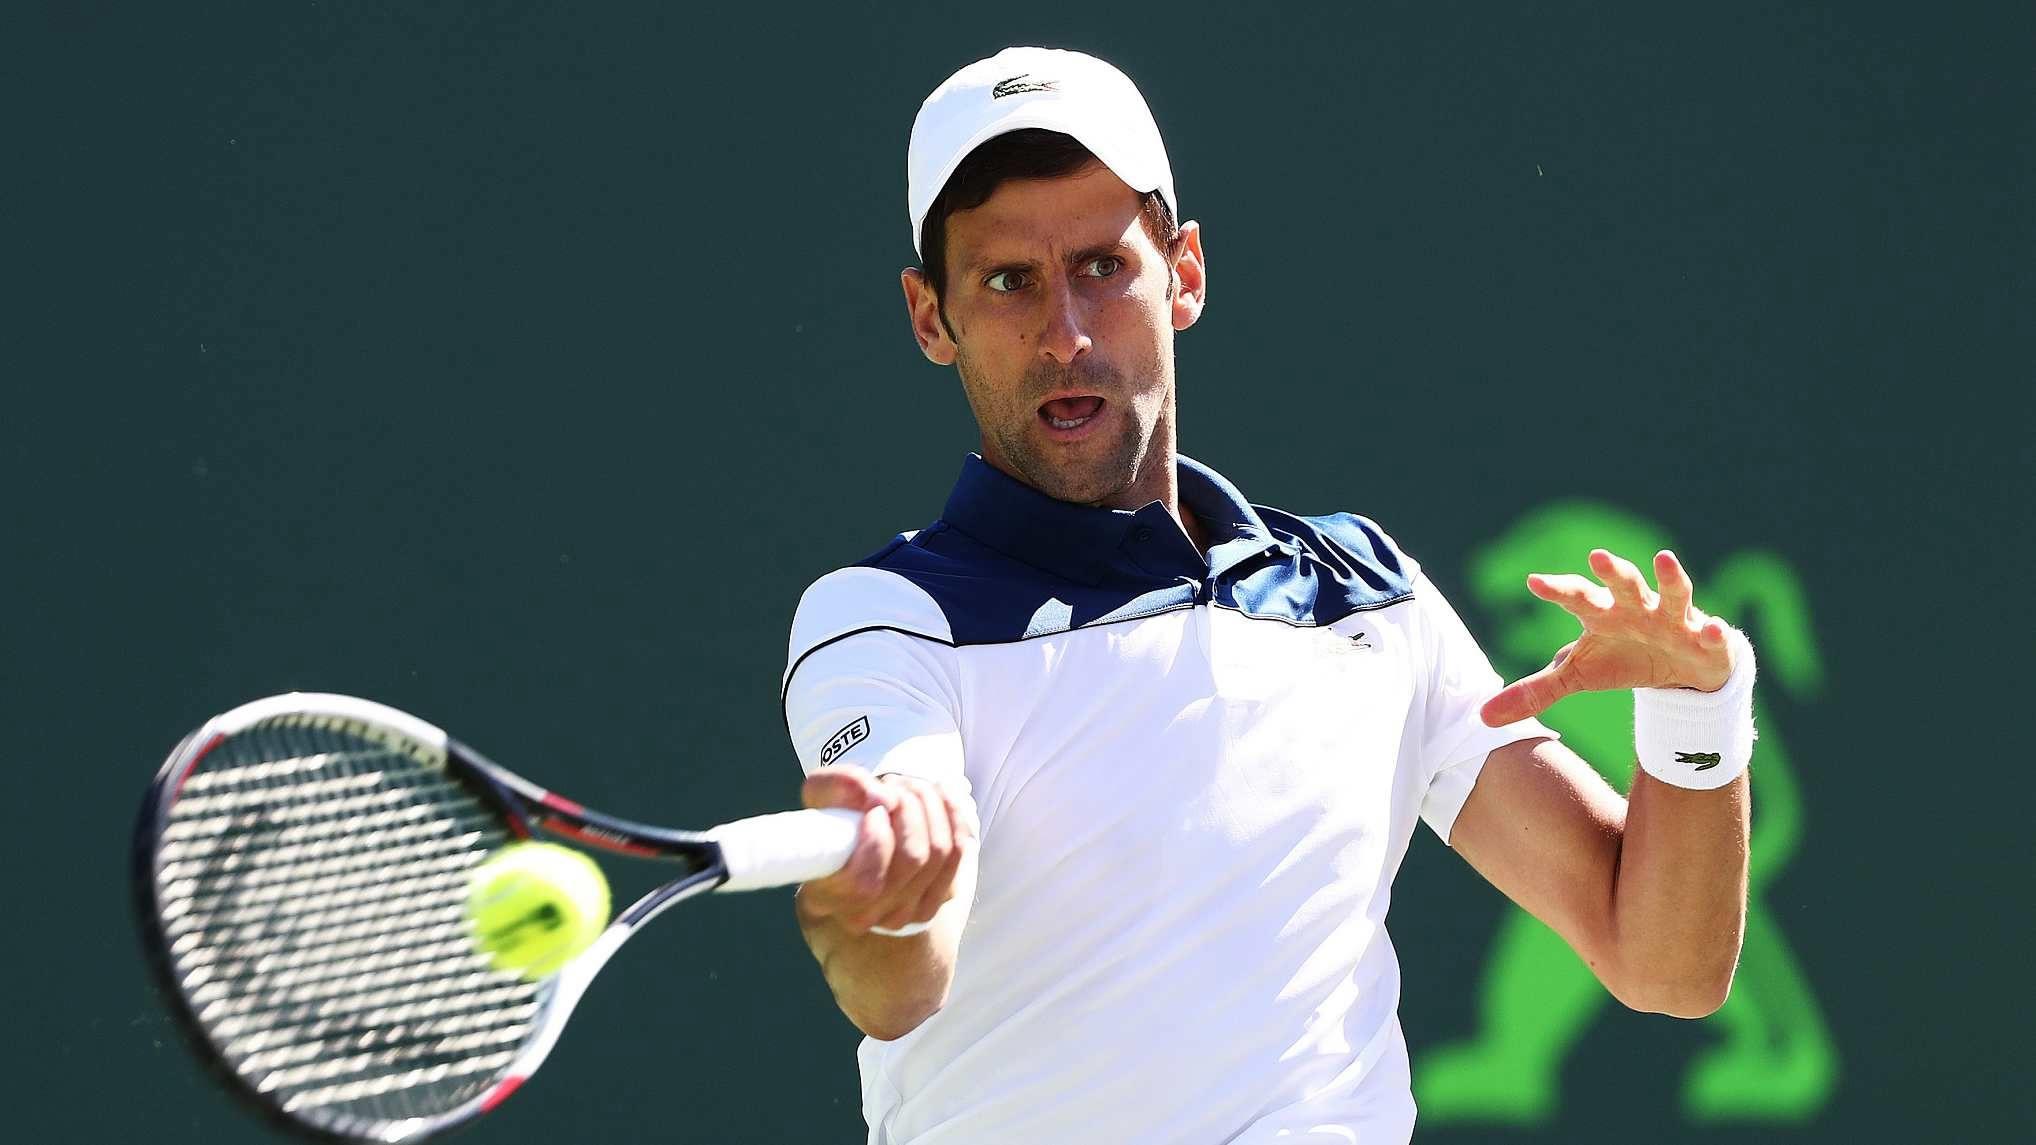 Djokovic says he tested positive for coronavirus